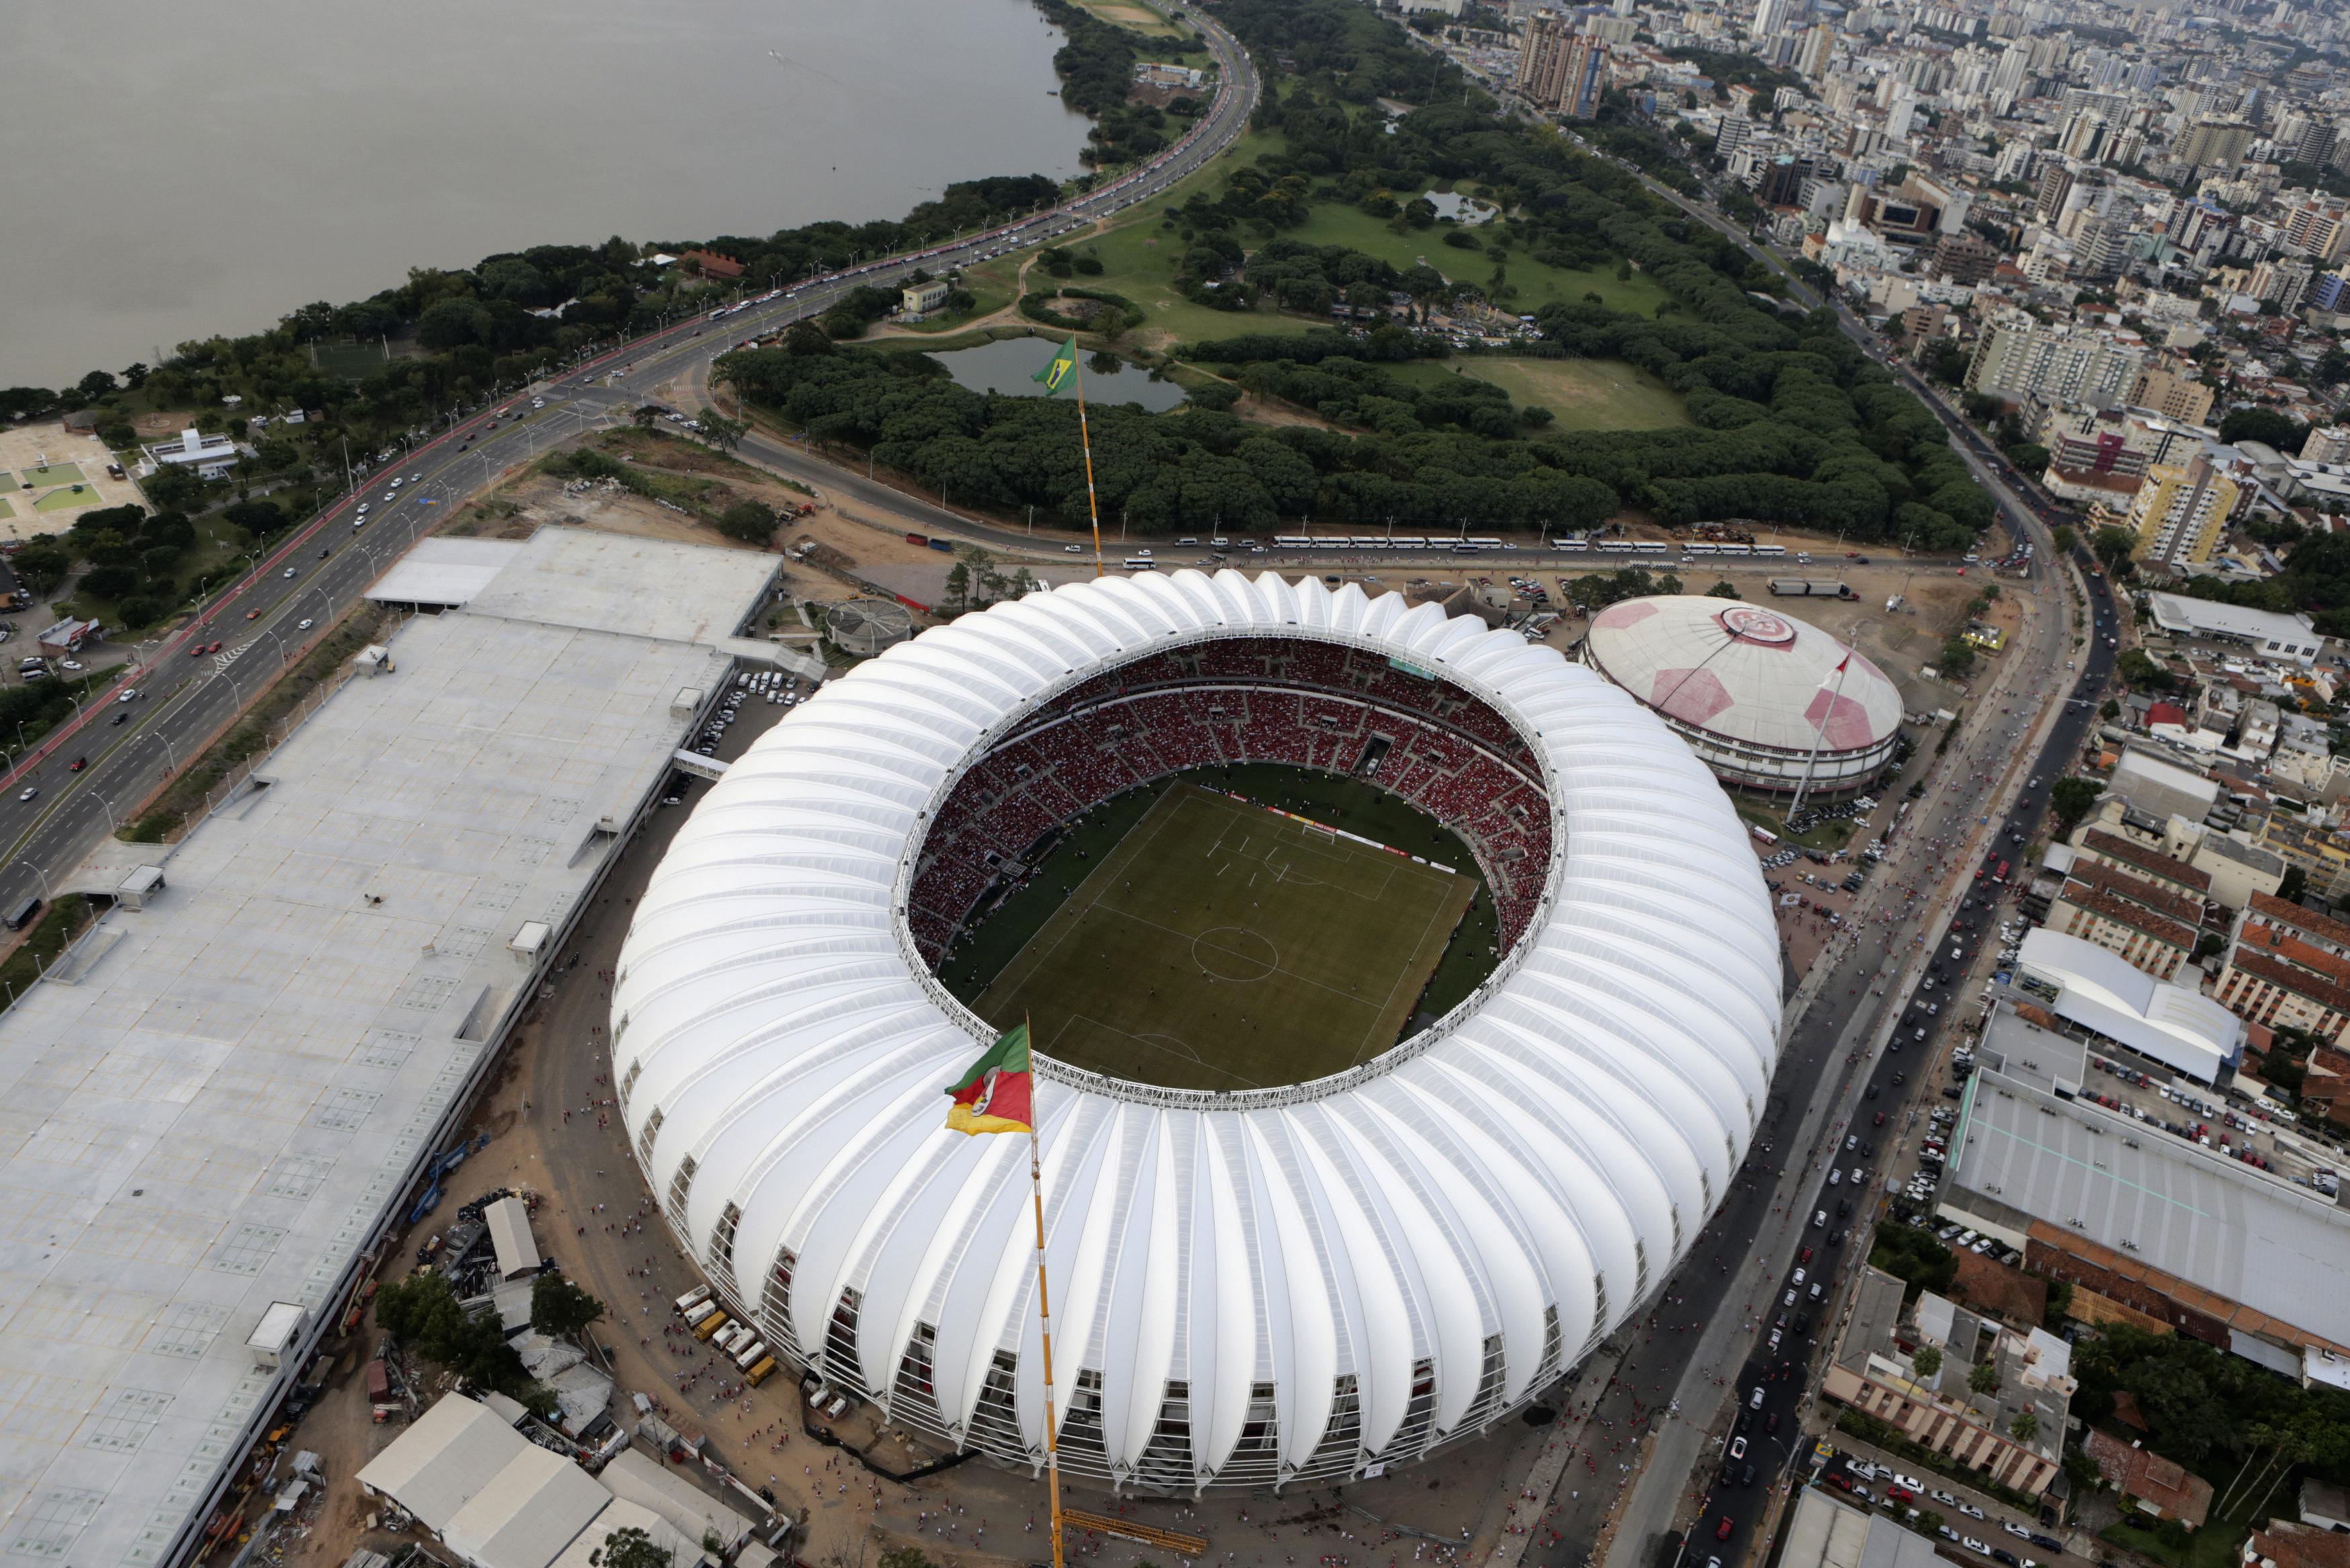 Estadio Beira-Rio                                                              City: Porto Alegre                                                              Contructed: 1969                                                              Capacity: 43,000